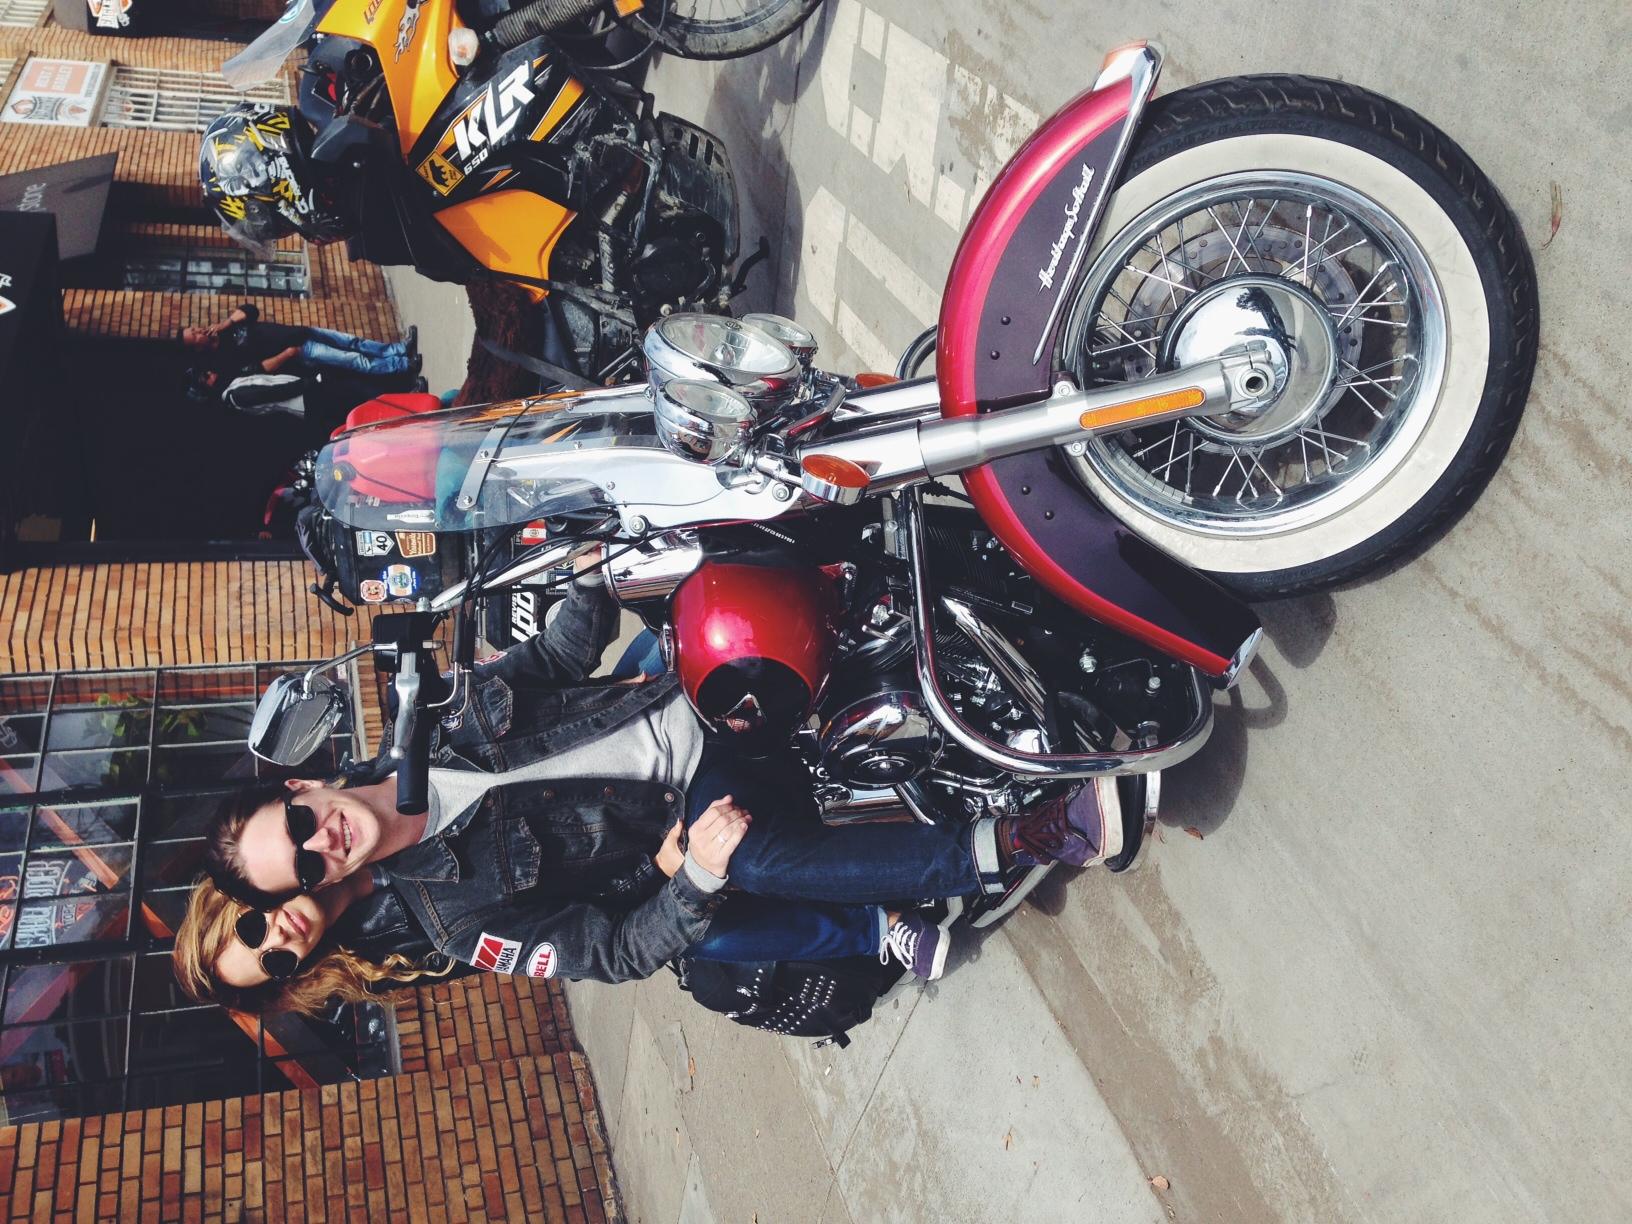 We got a Harley Davidson Heritage Softtall